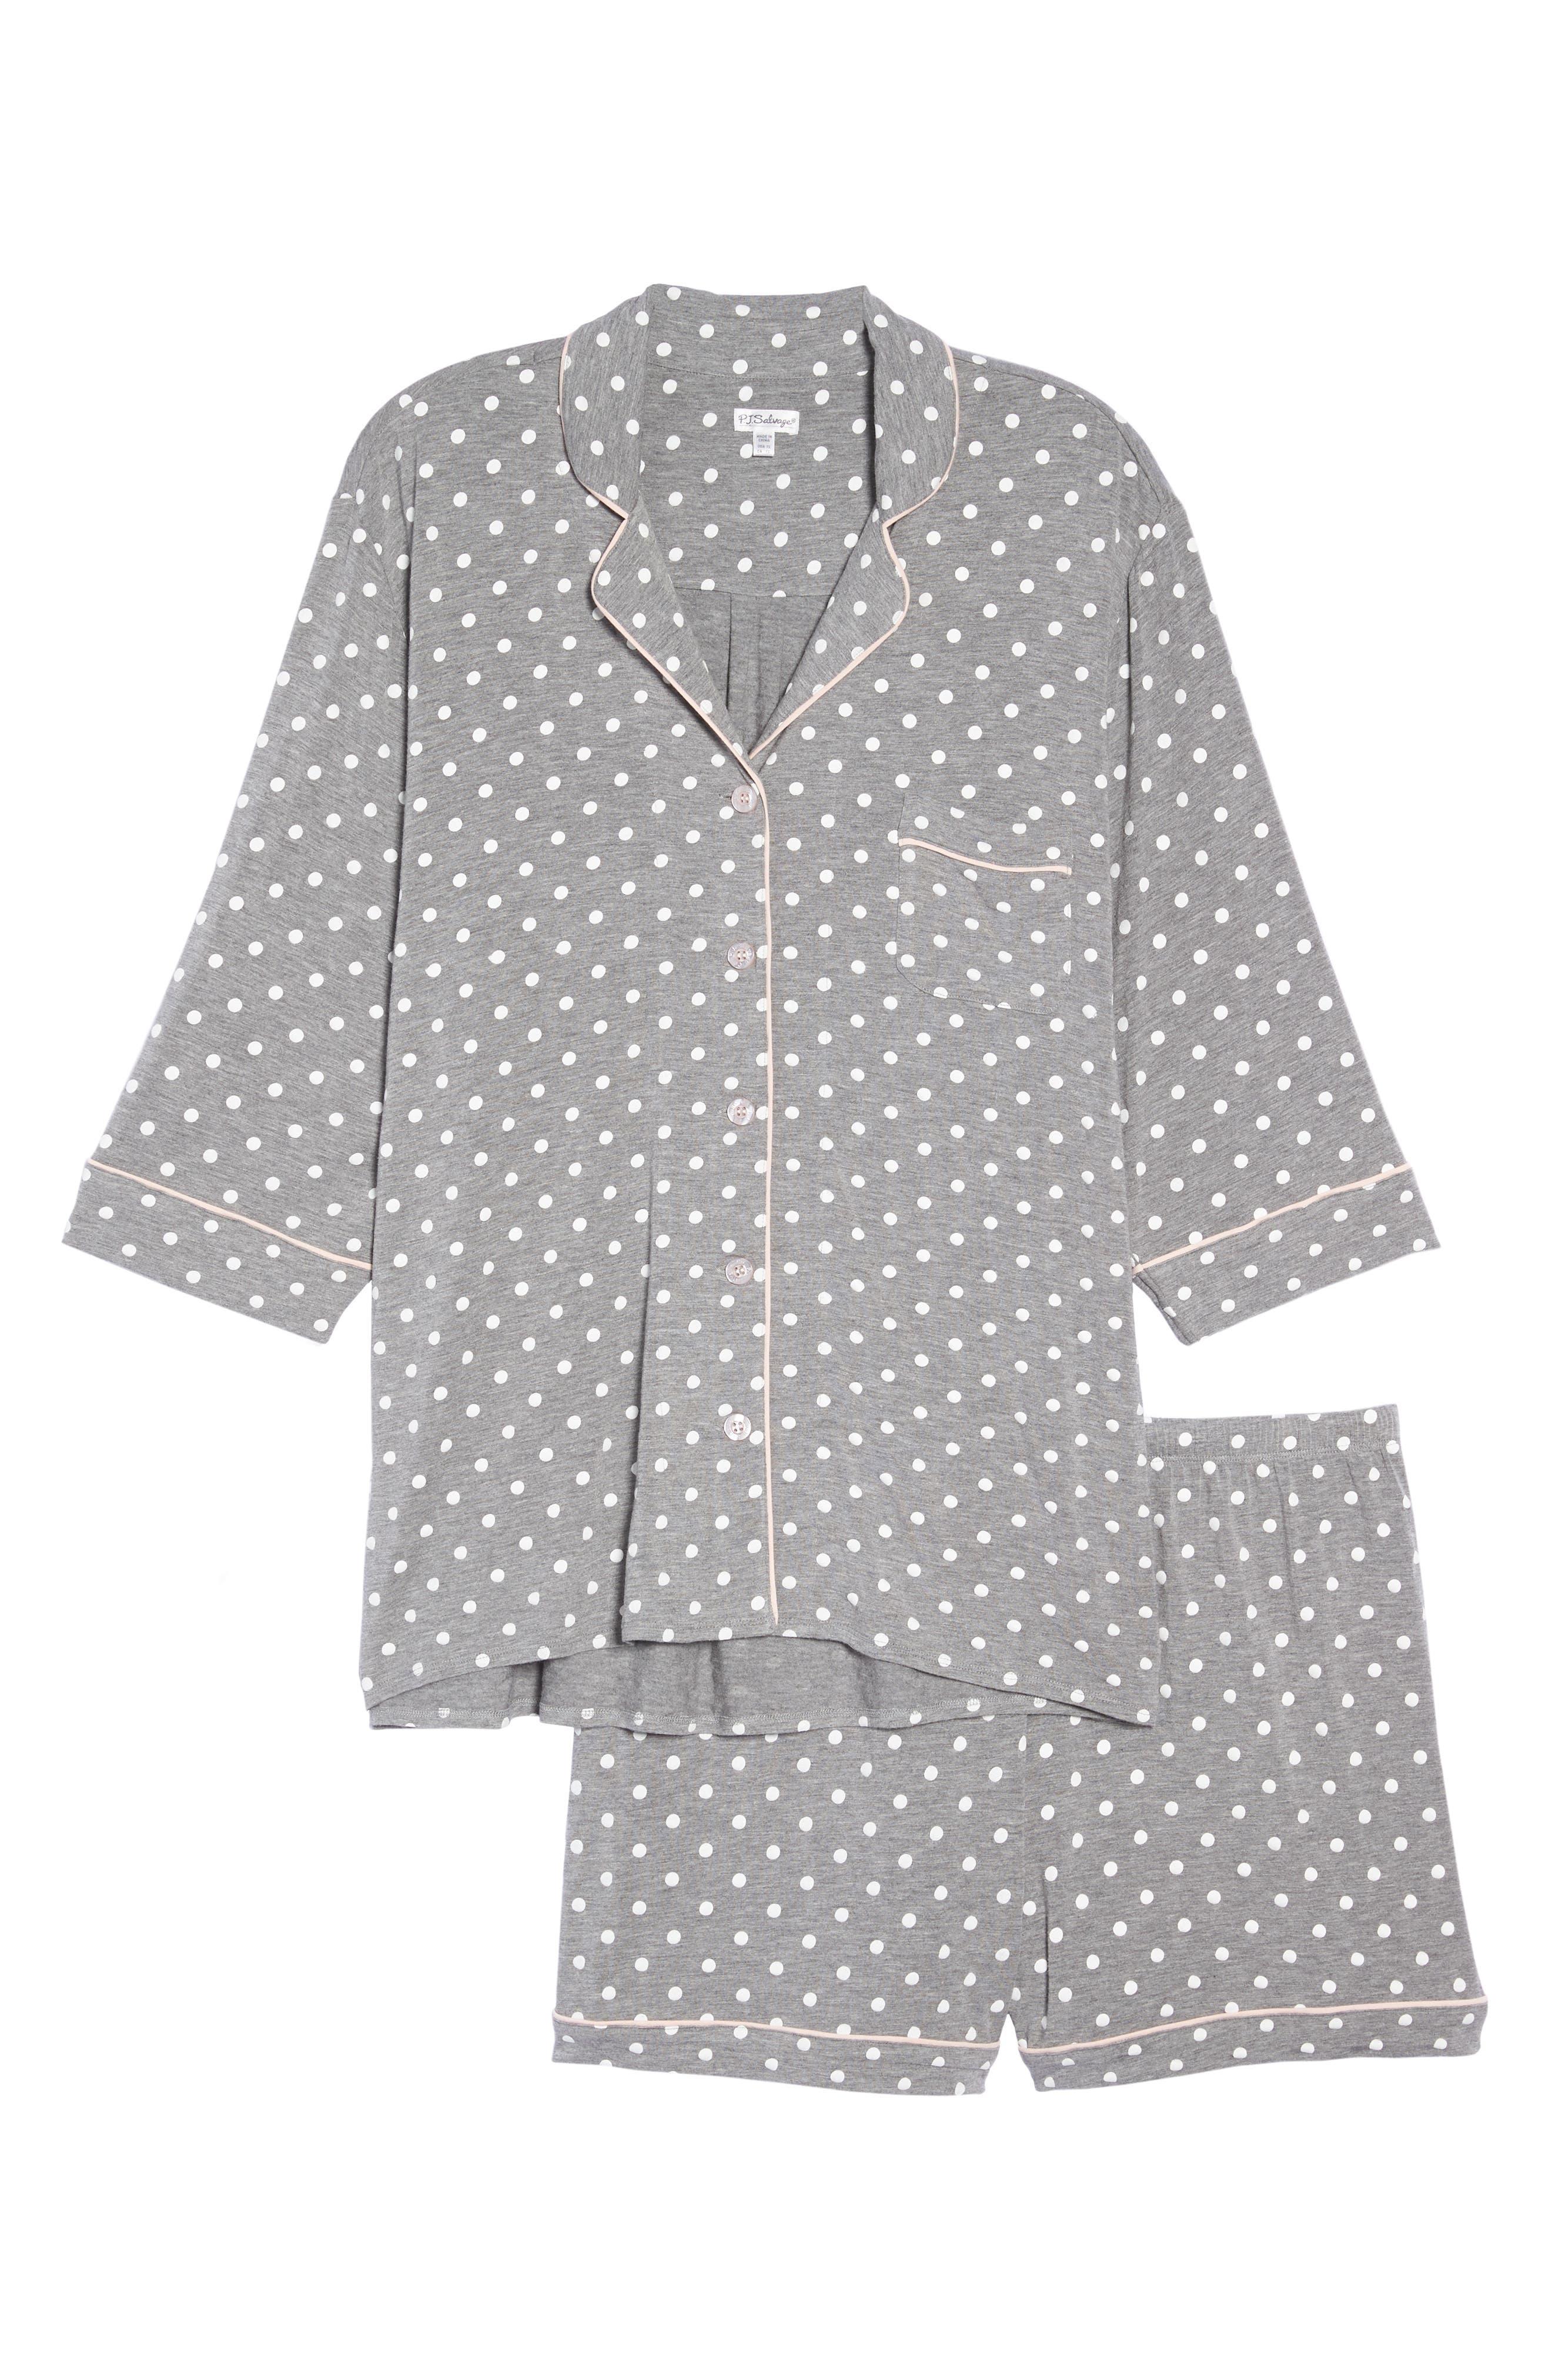 Modal Three-Quarter Sleeve Short Pajamas,                             Alternate thumbnail 6, color,                             027